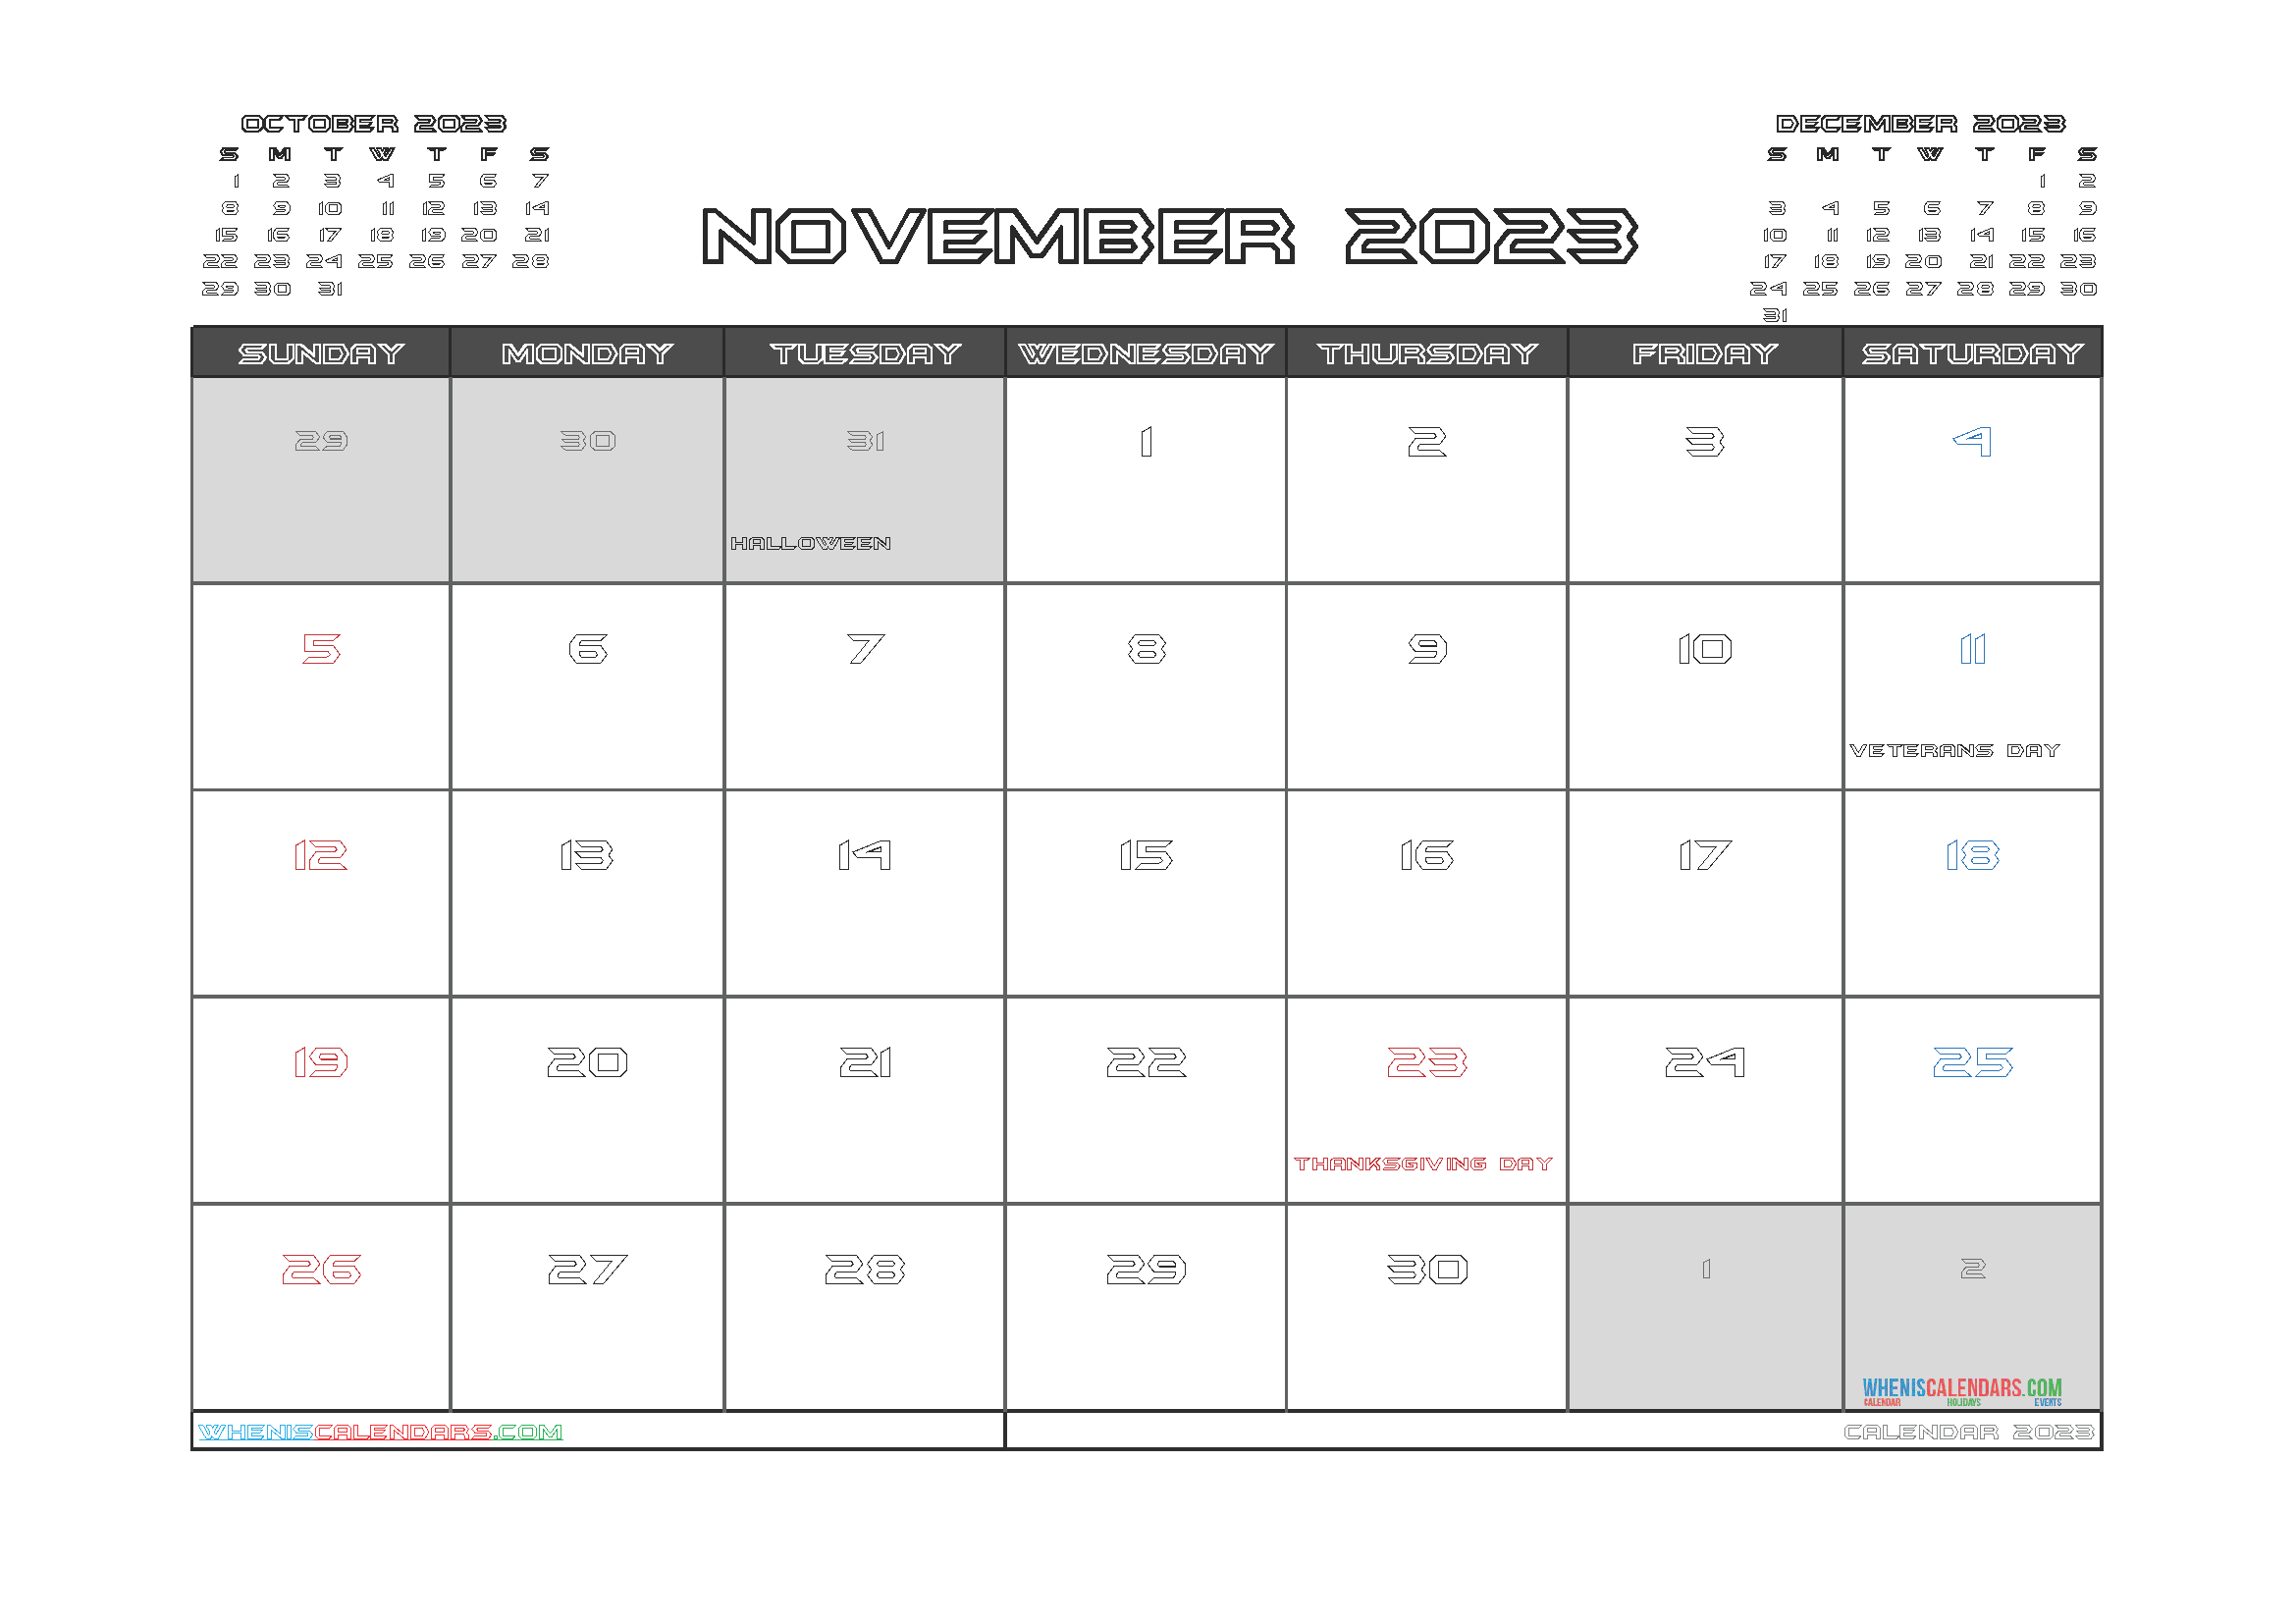 Printable Calendar November 2023 Free